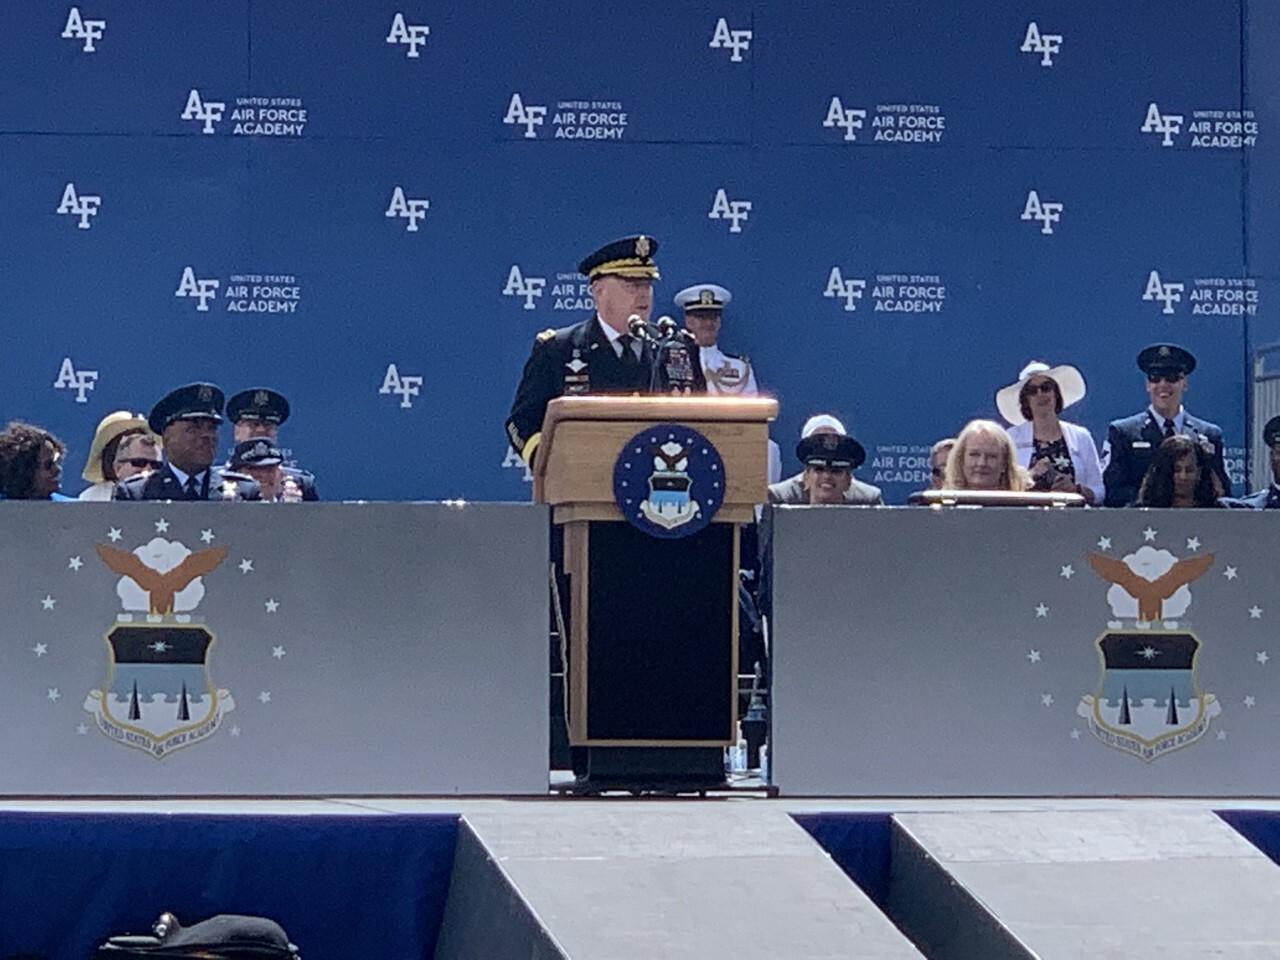 Gen. Milley making commencement address